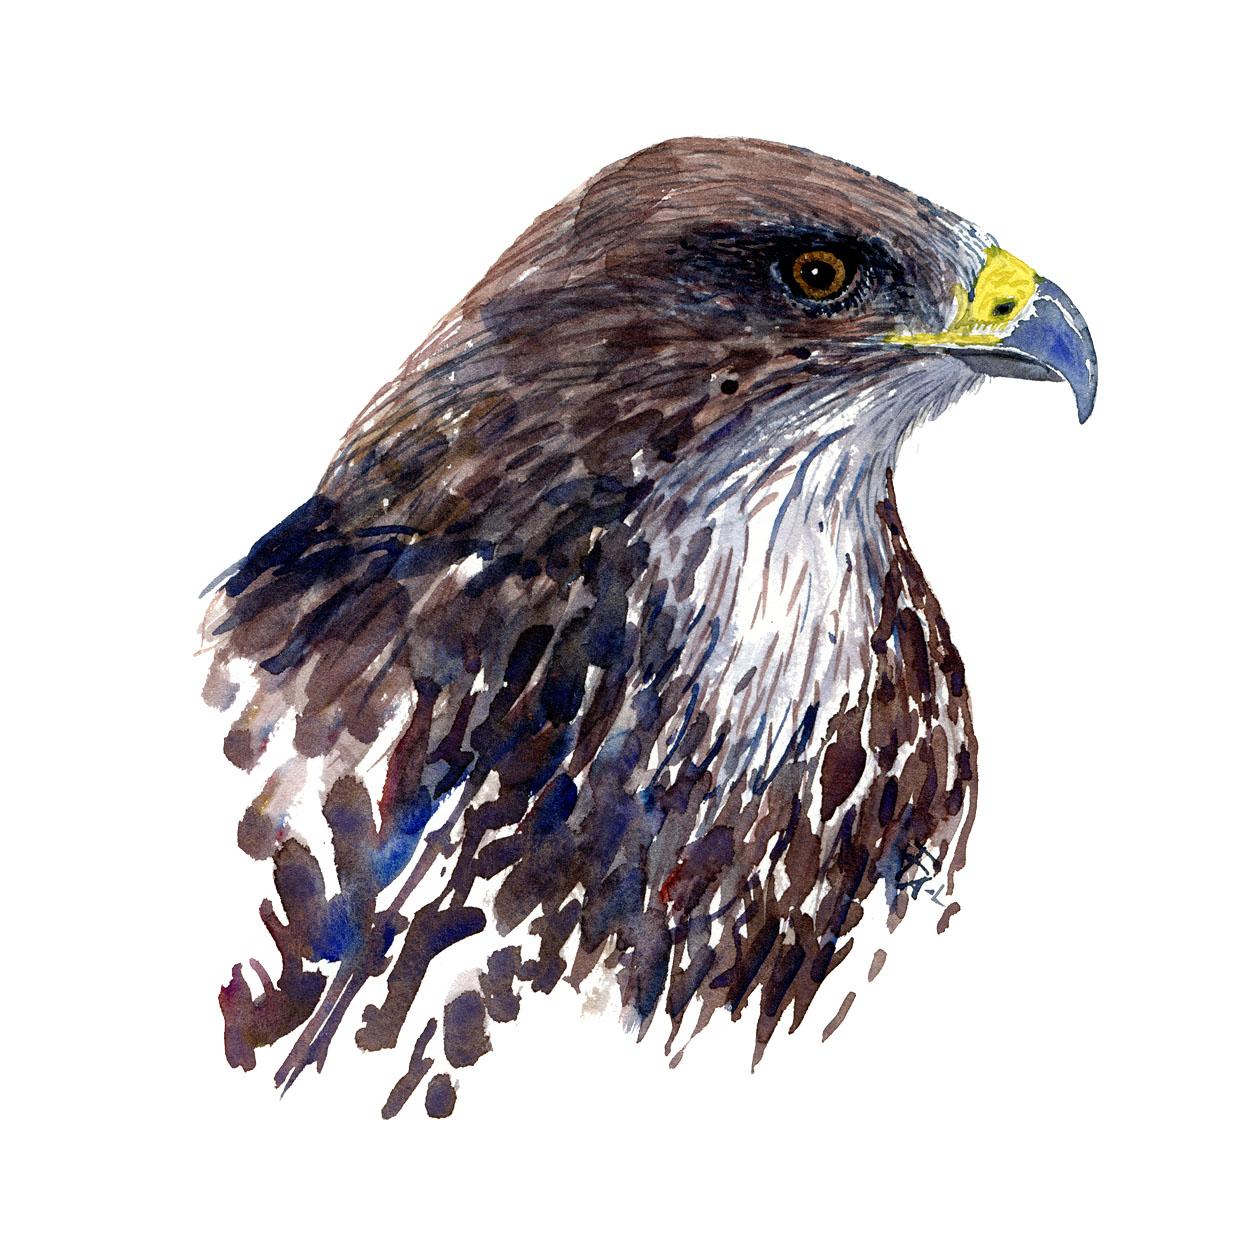 Watercolor of a buzzard bird. Art by Frits Ahlefeldt